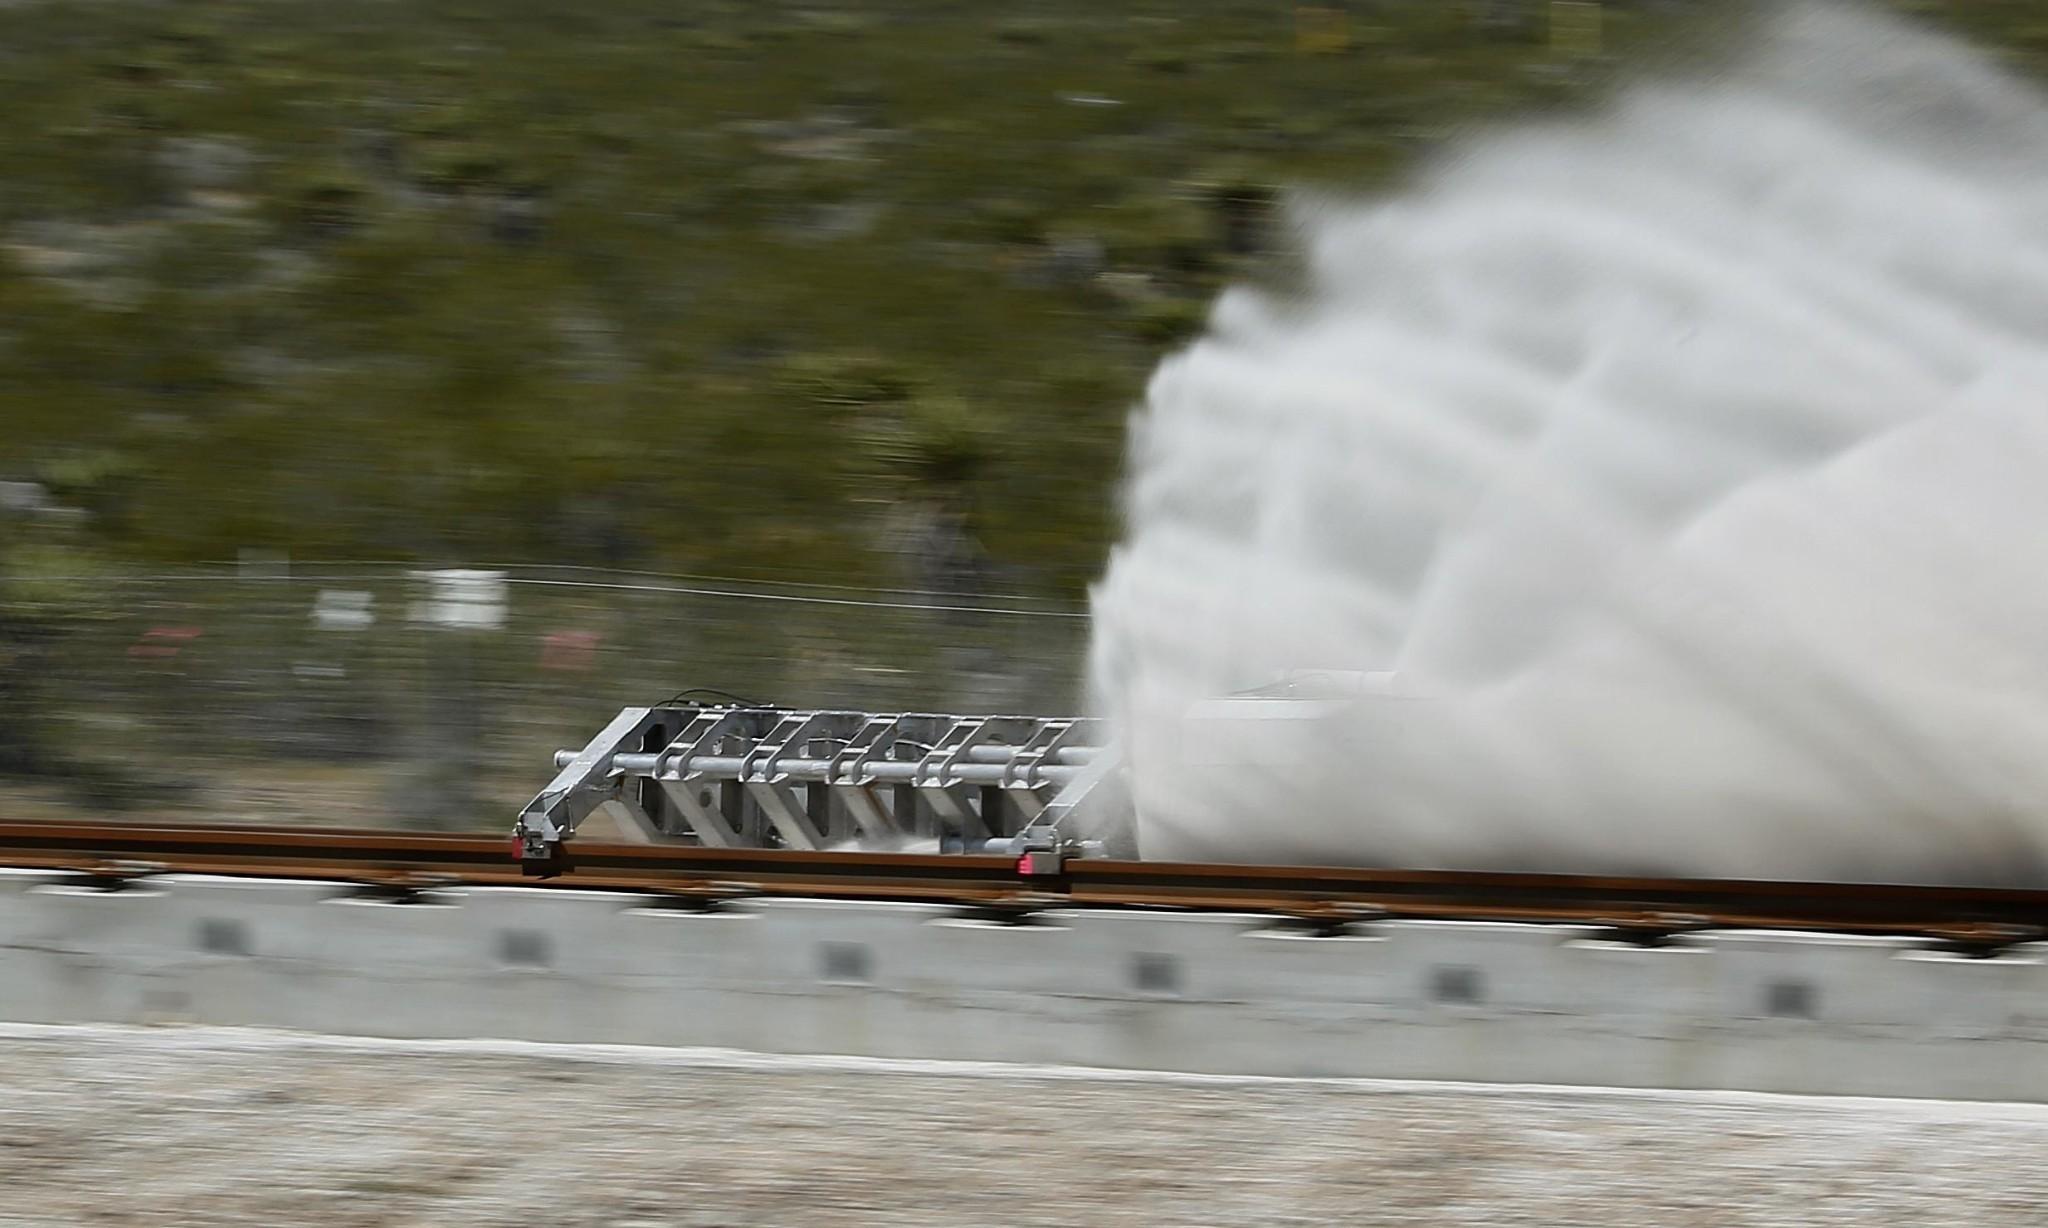 Hyperloop undergoes successful test of high-speed propulsion system